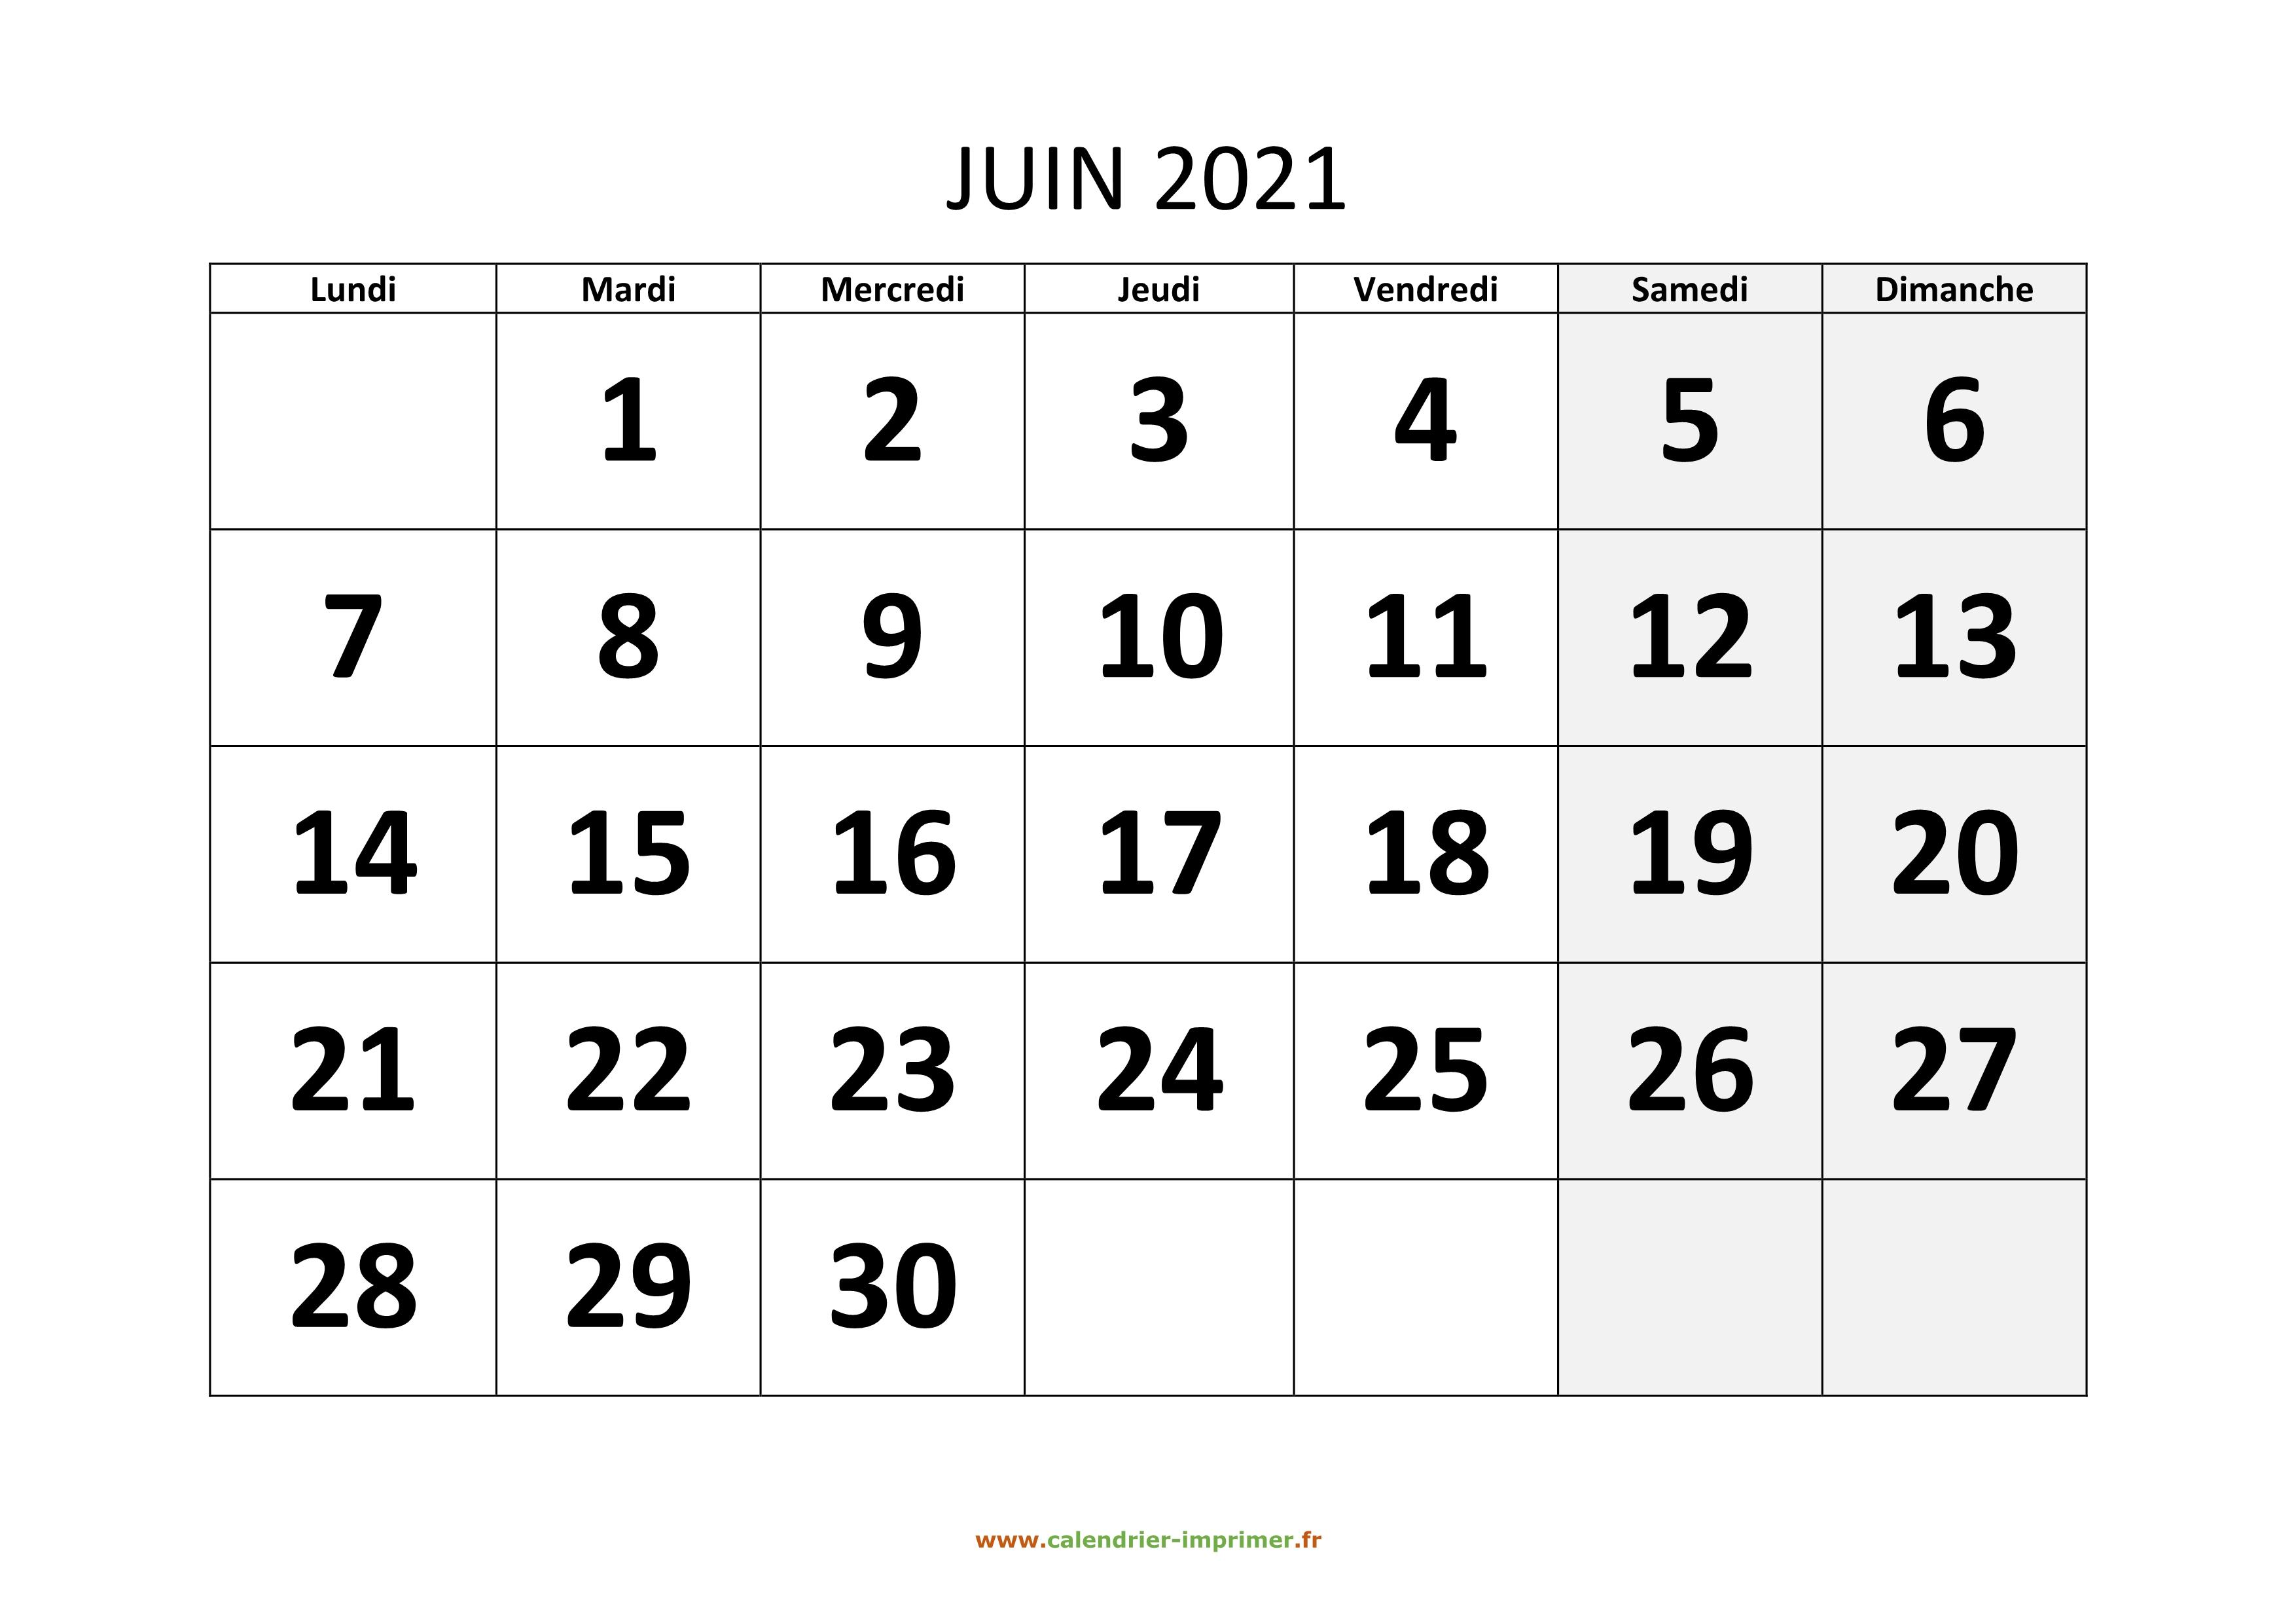 Calendrier Juin 2021 A Imprimer Calendrier Juin 2021 à imprimer